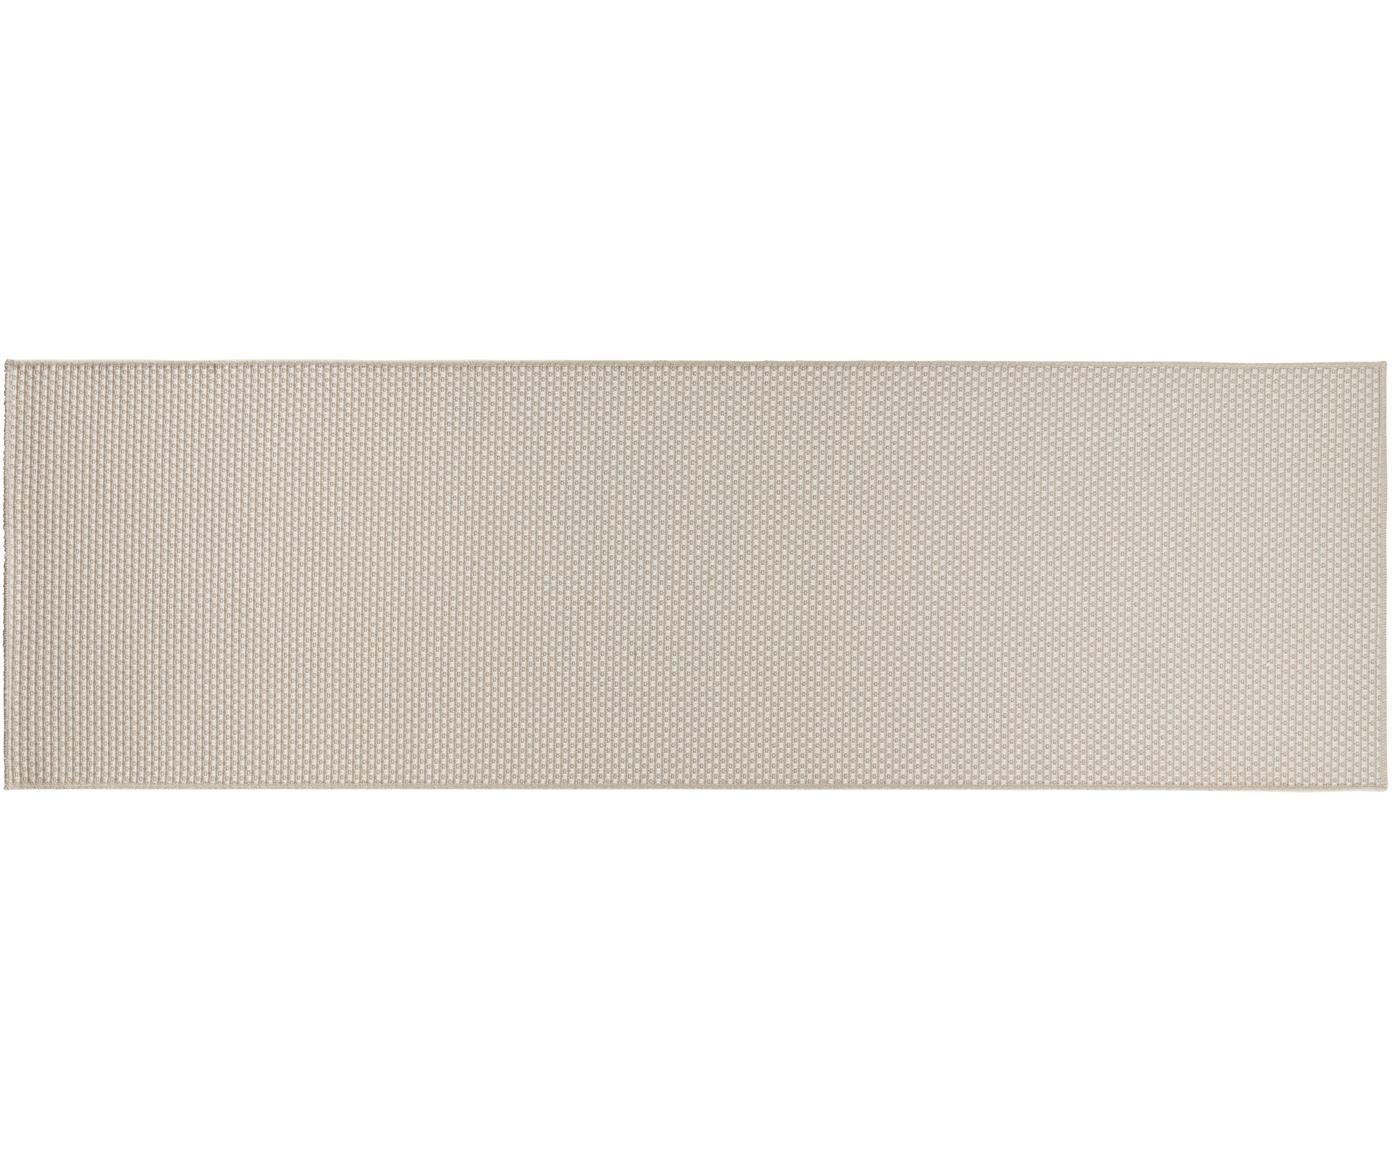 In- & Outdoor-Läufer Nala in Sisal-Optik, Elfenbeinfarben, 80 x 250 cm